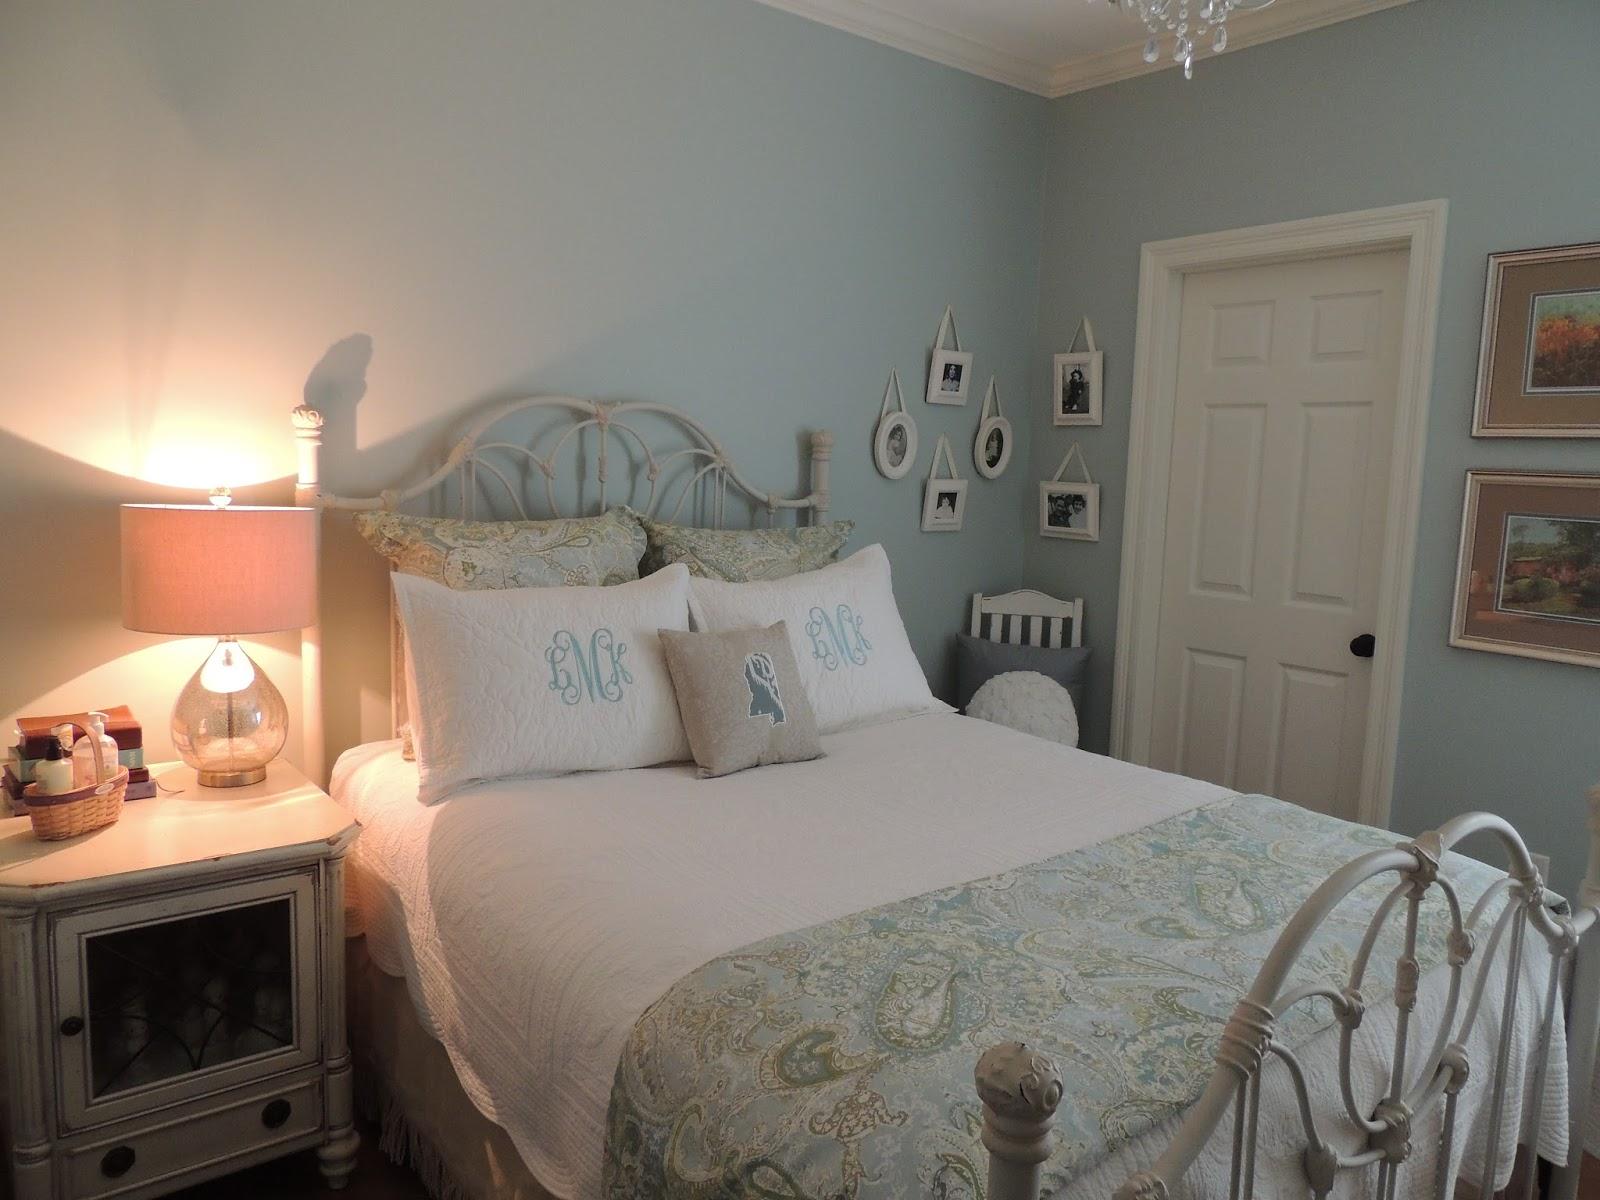 Guest Room Renovations : Buttercup bliss guest bedroom renovation